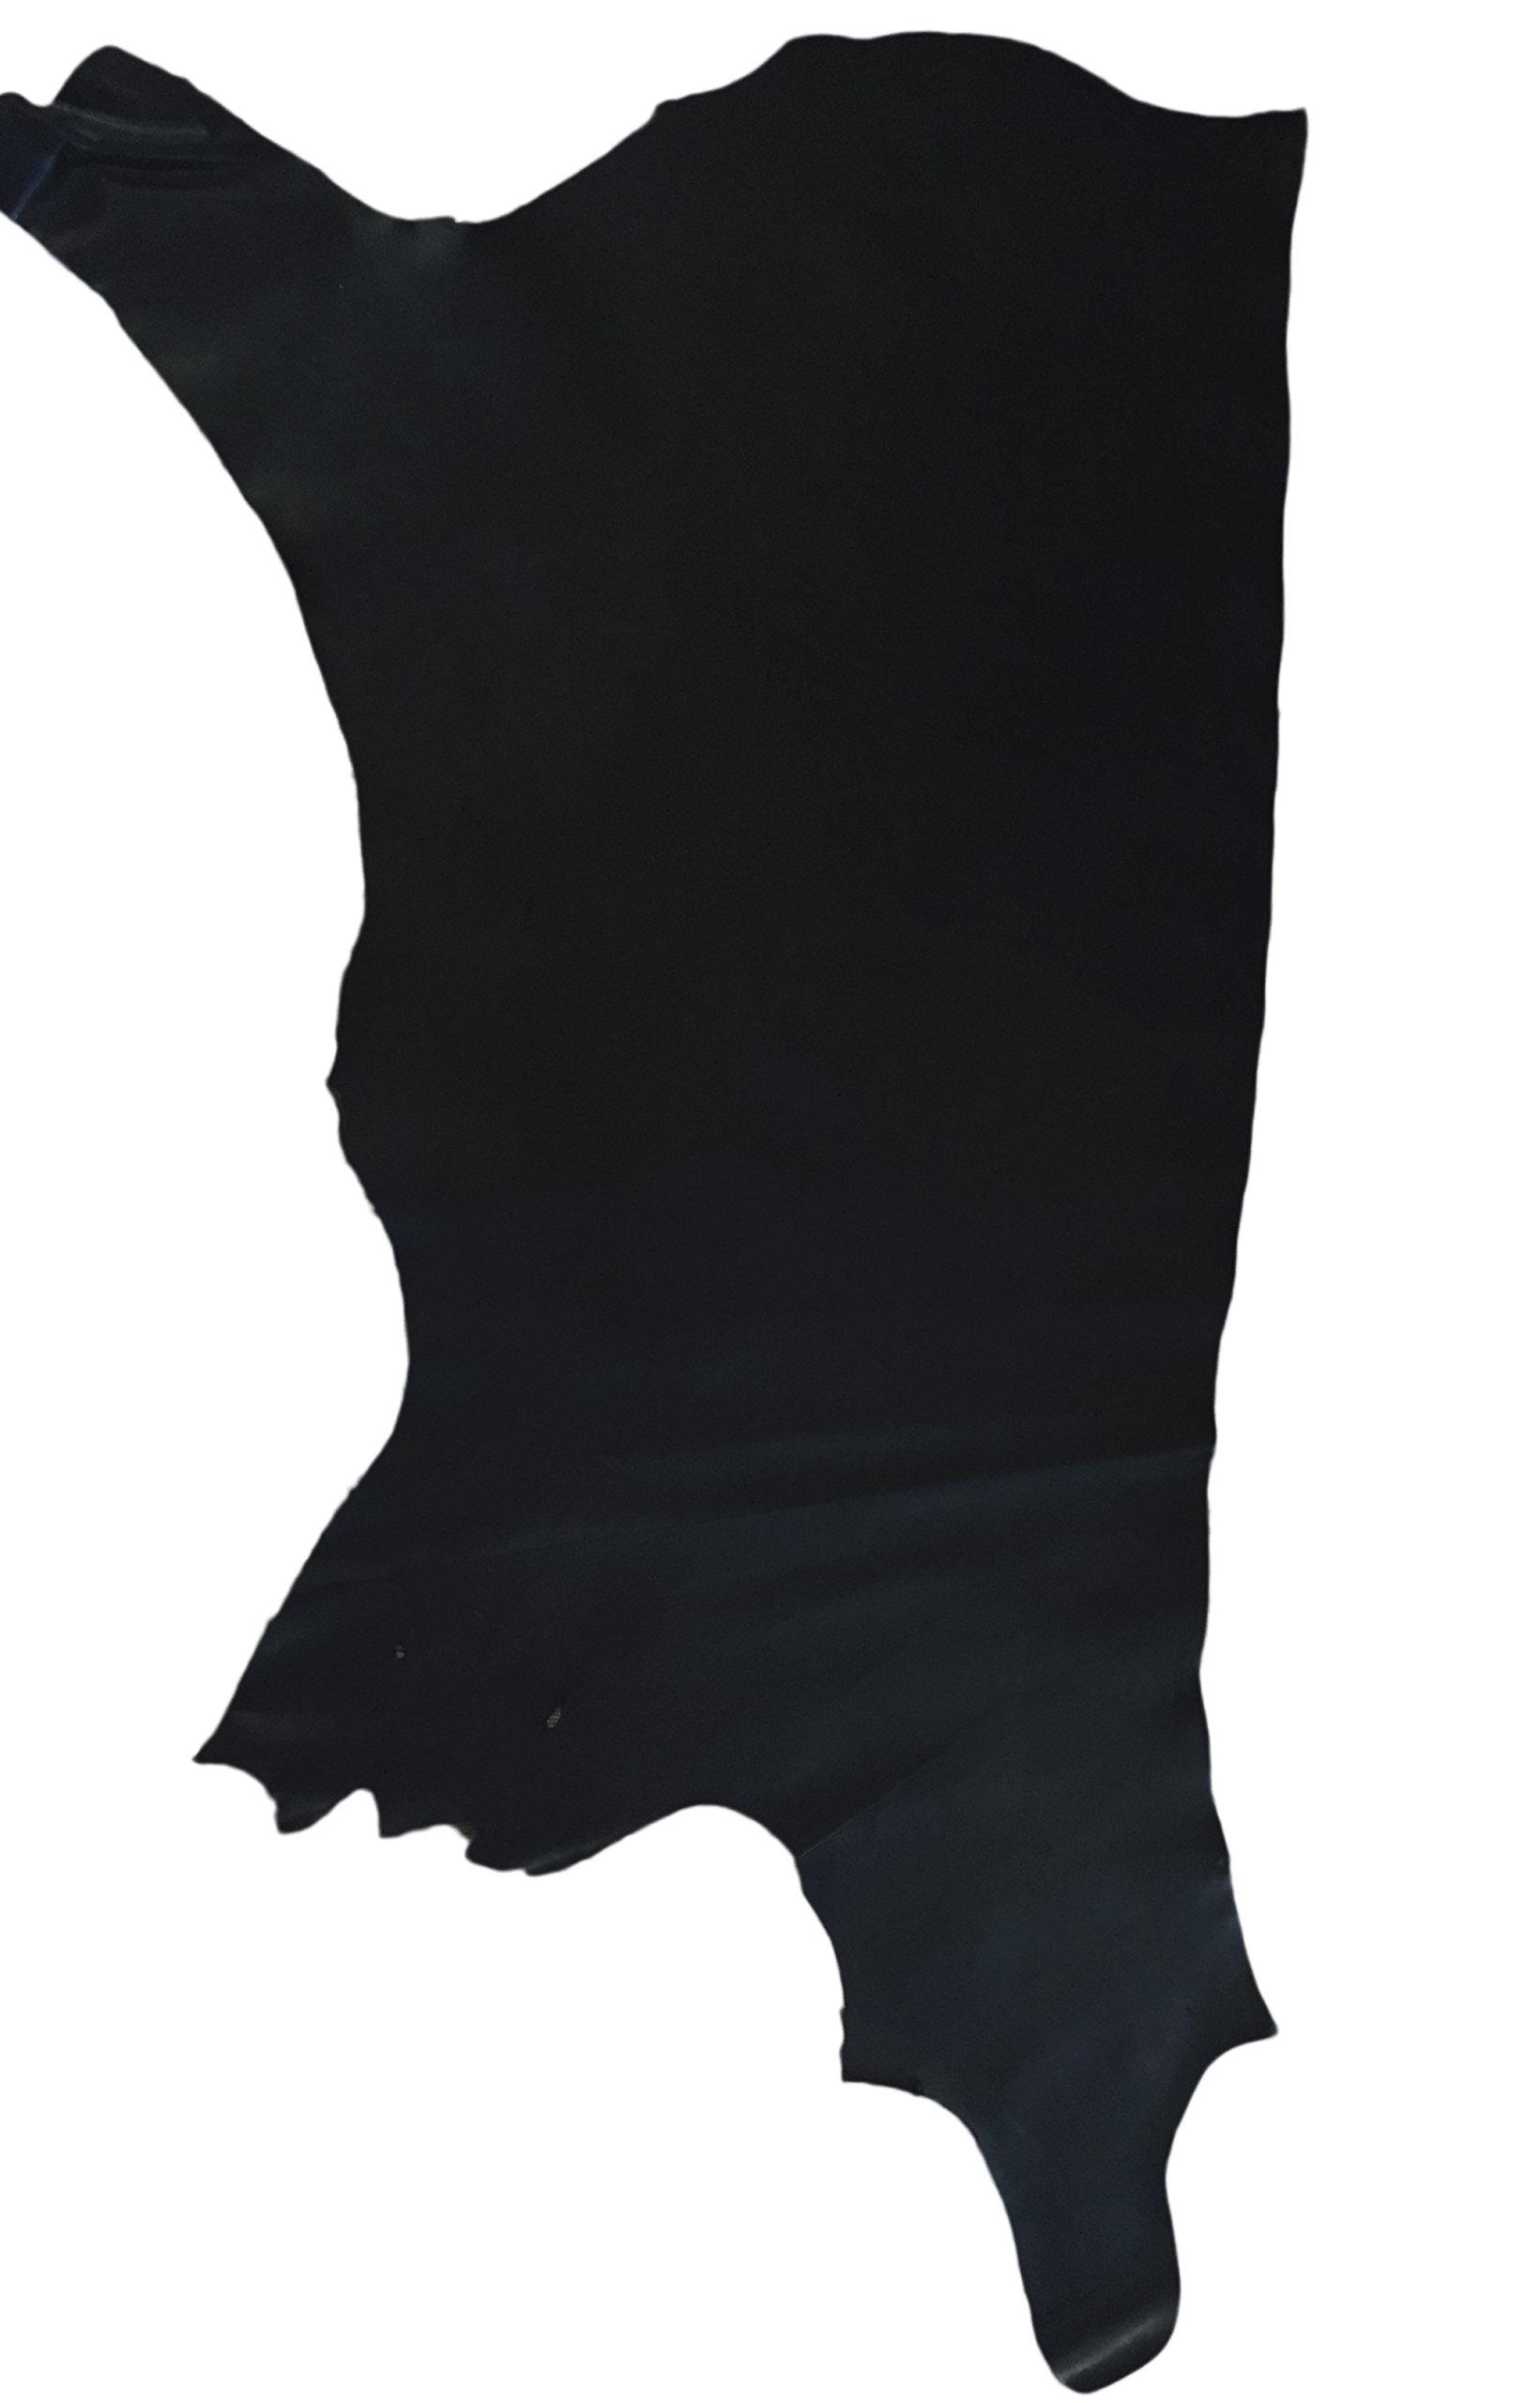 Premium Oil Tanned Leather (Full Side, Titan Black)